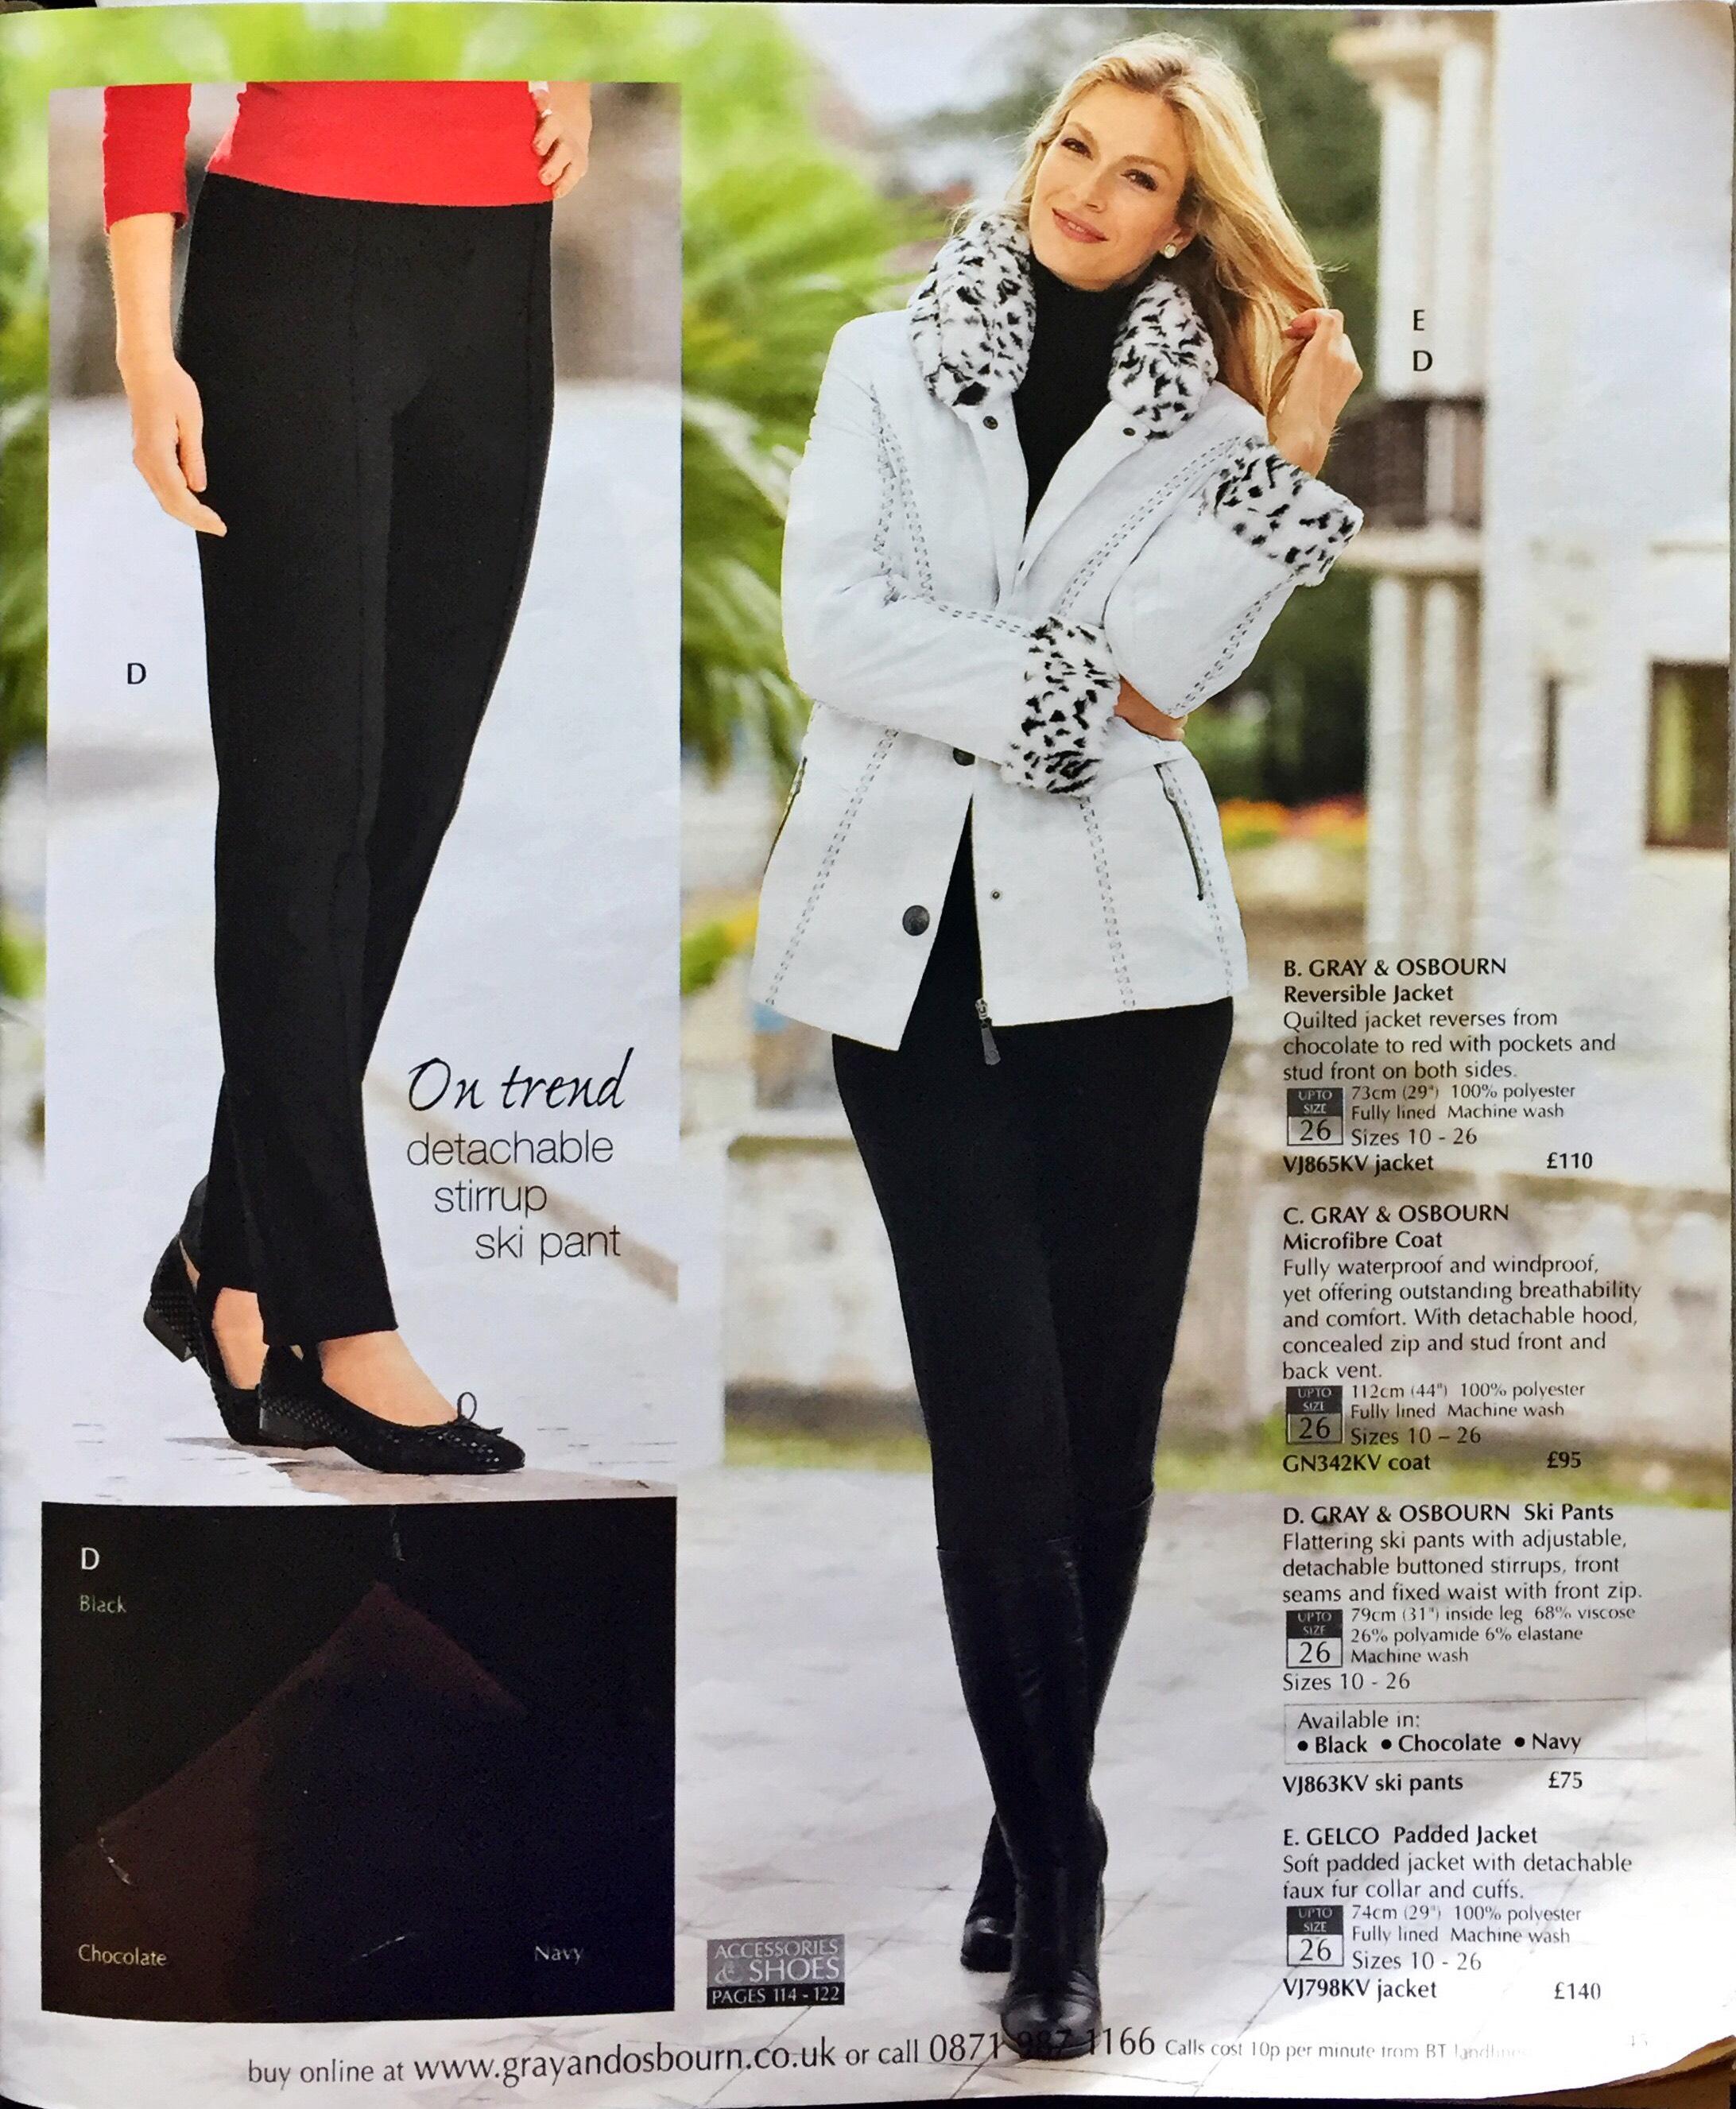 Gray and osbourne fashion 45